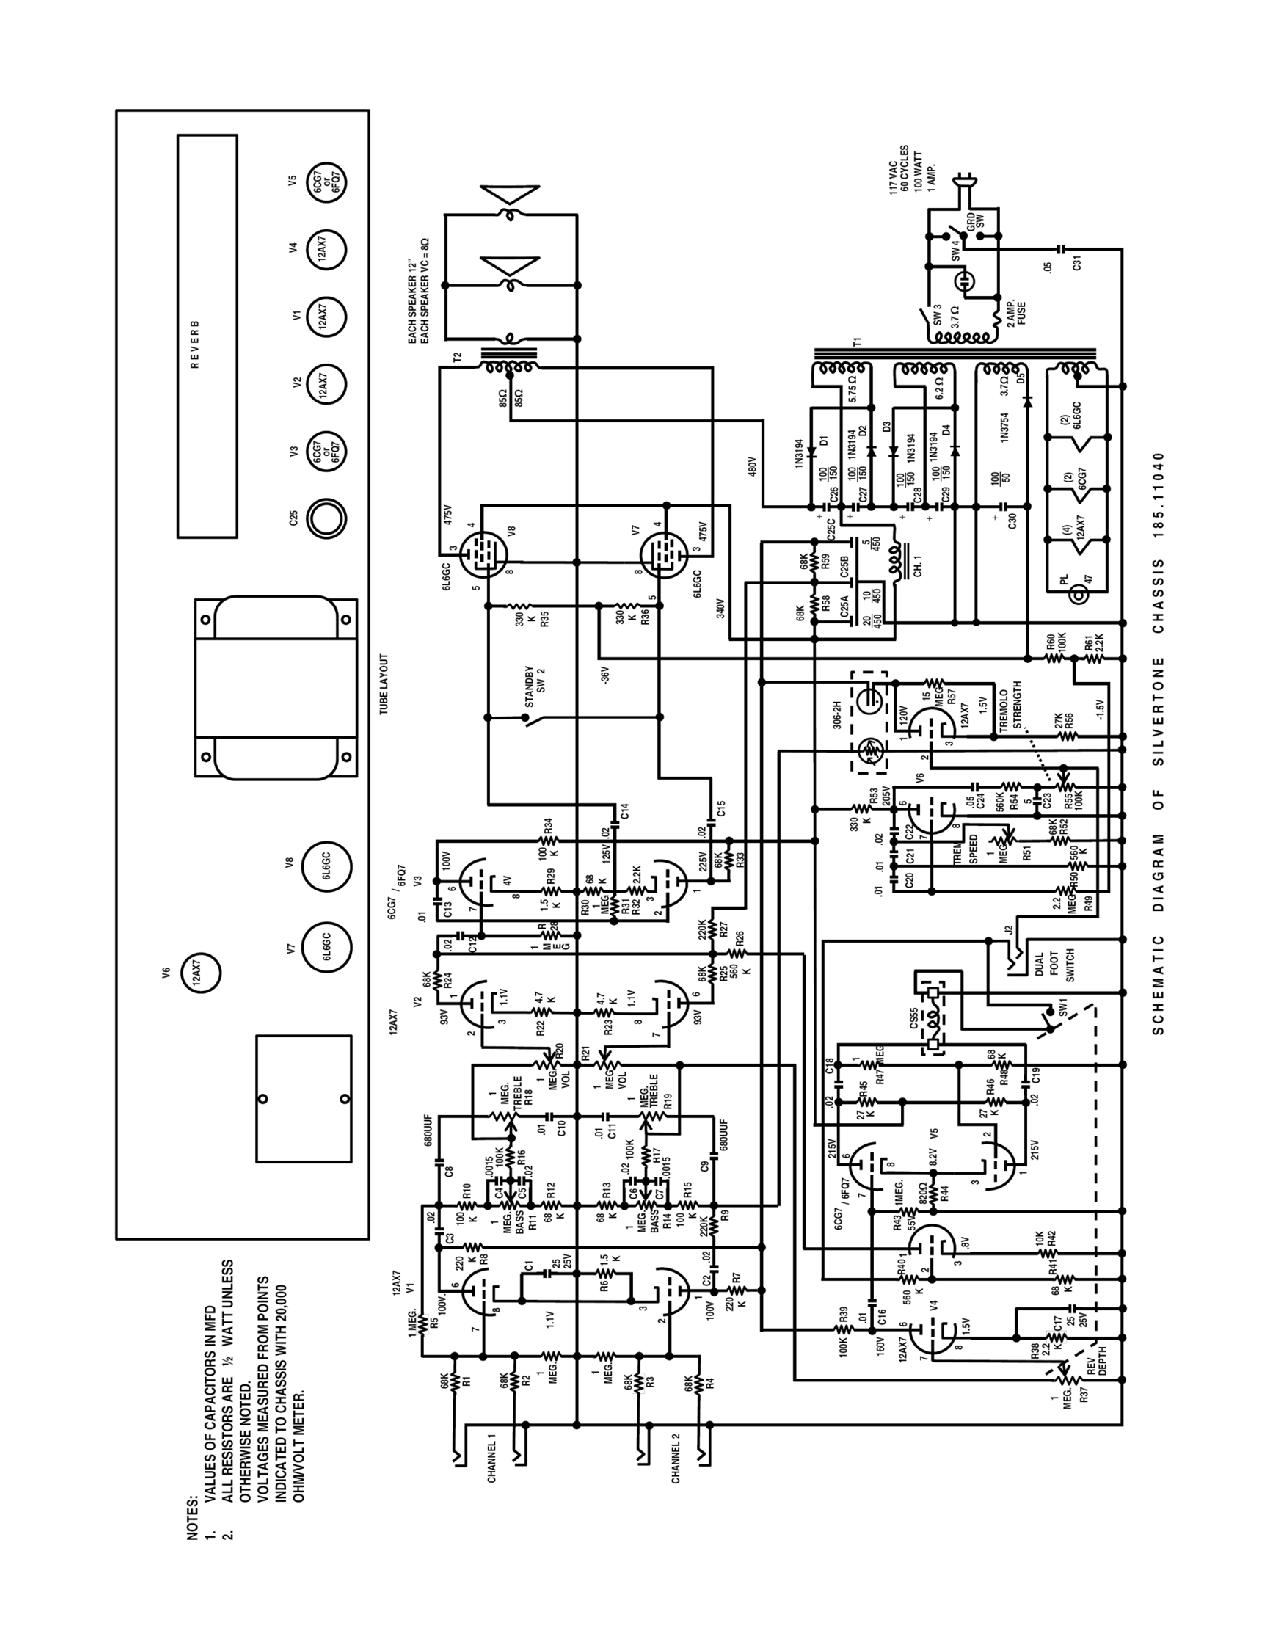 silvertone world - amplifiers - 1960s - model 1484 - schematic  silvertone world